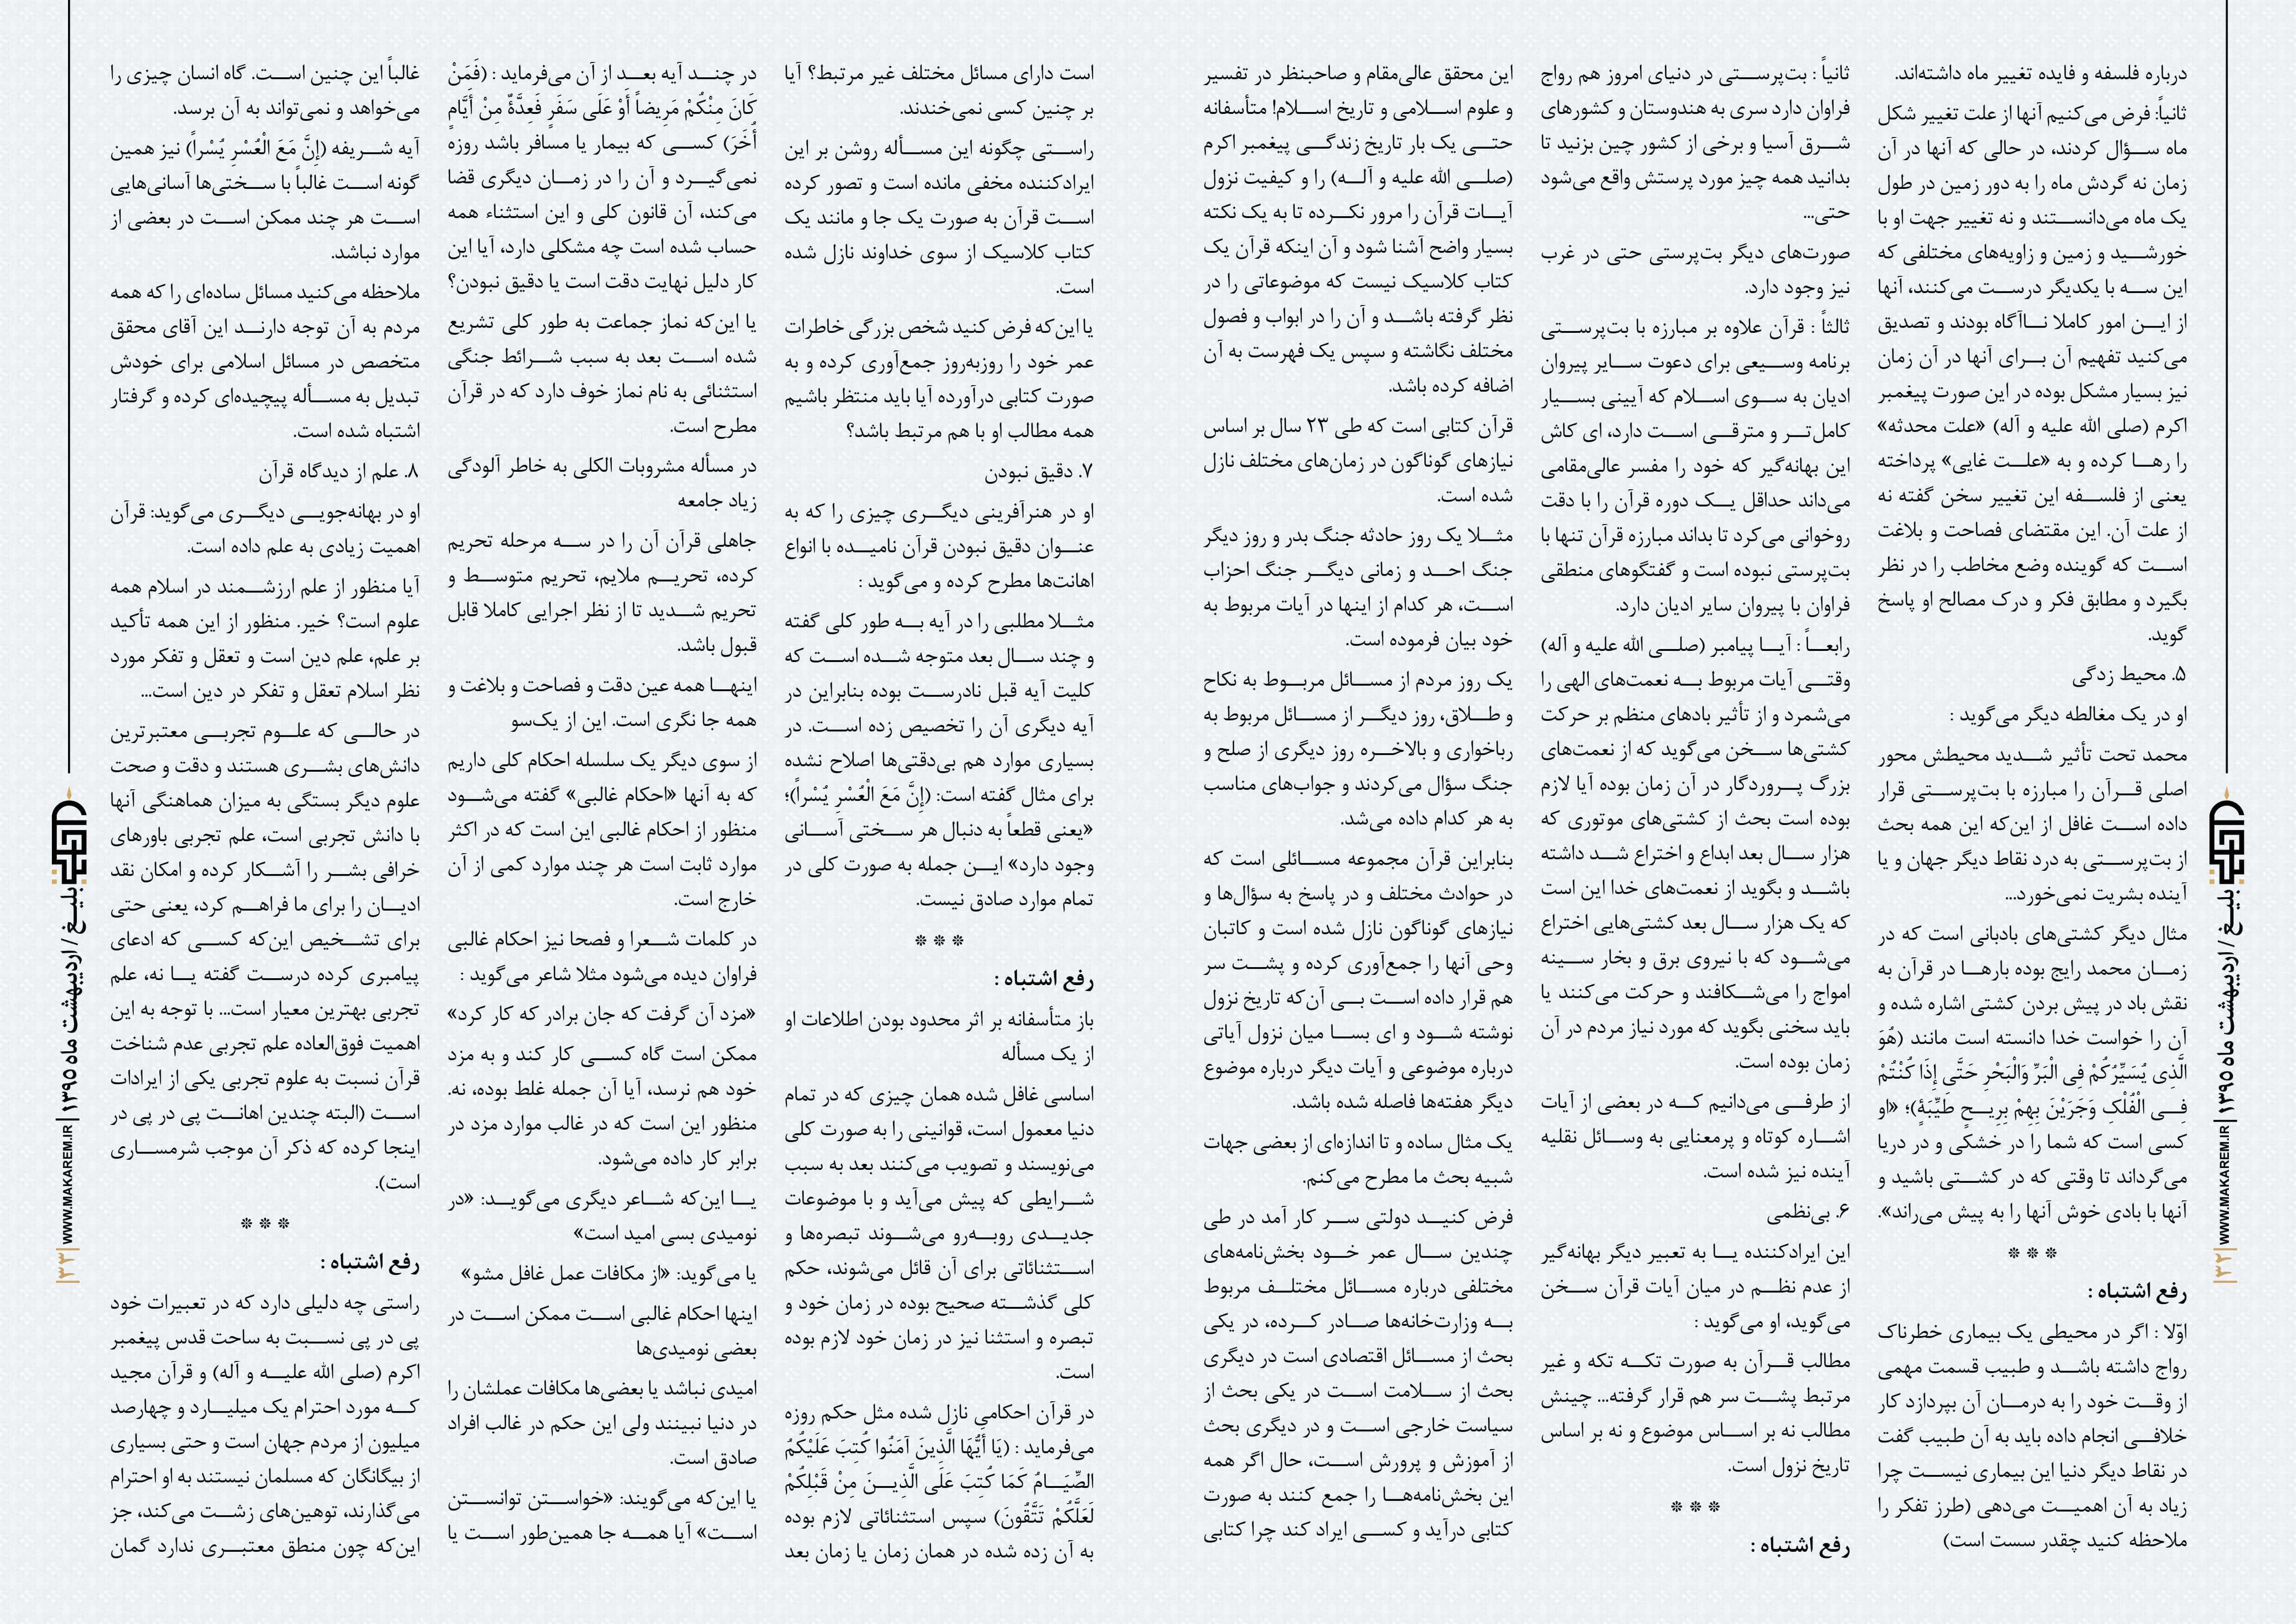 17-مدرسه الامام امیر المومنین (ع)